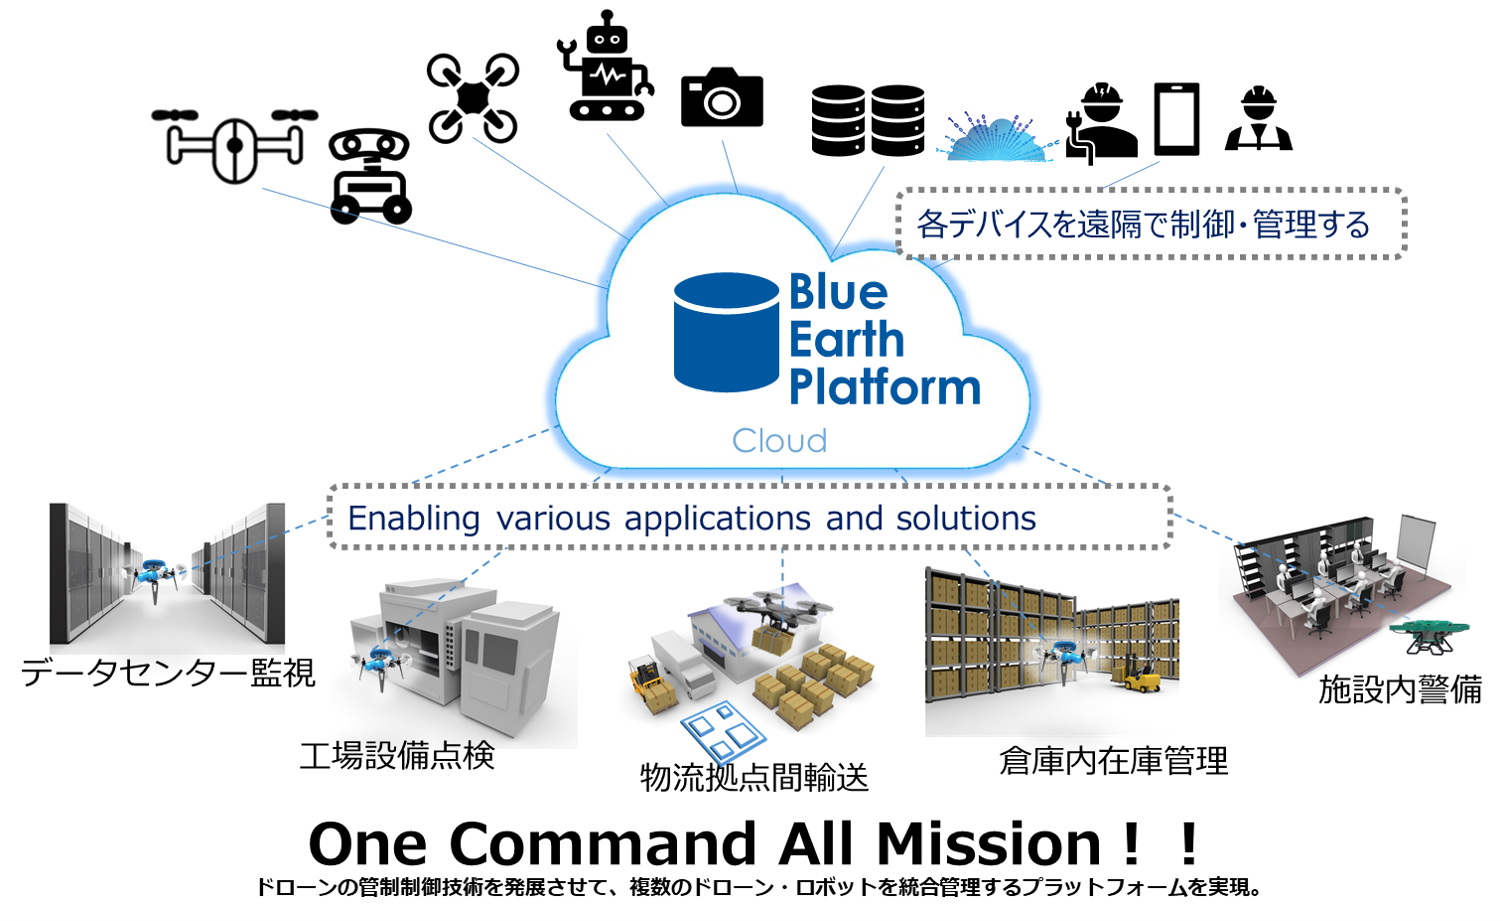 Blue Earth Platform